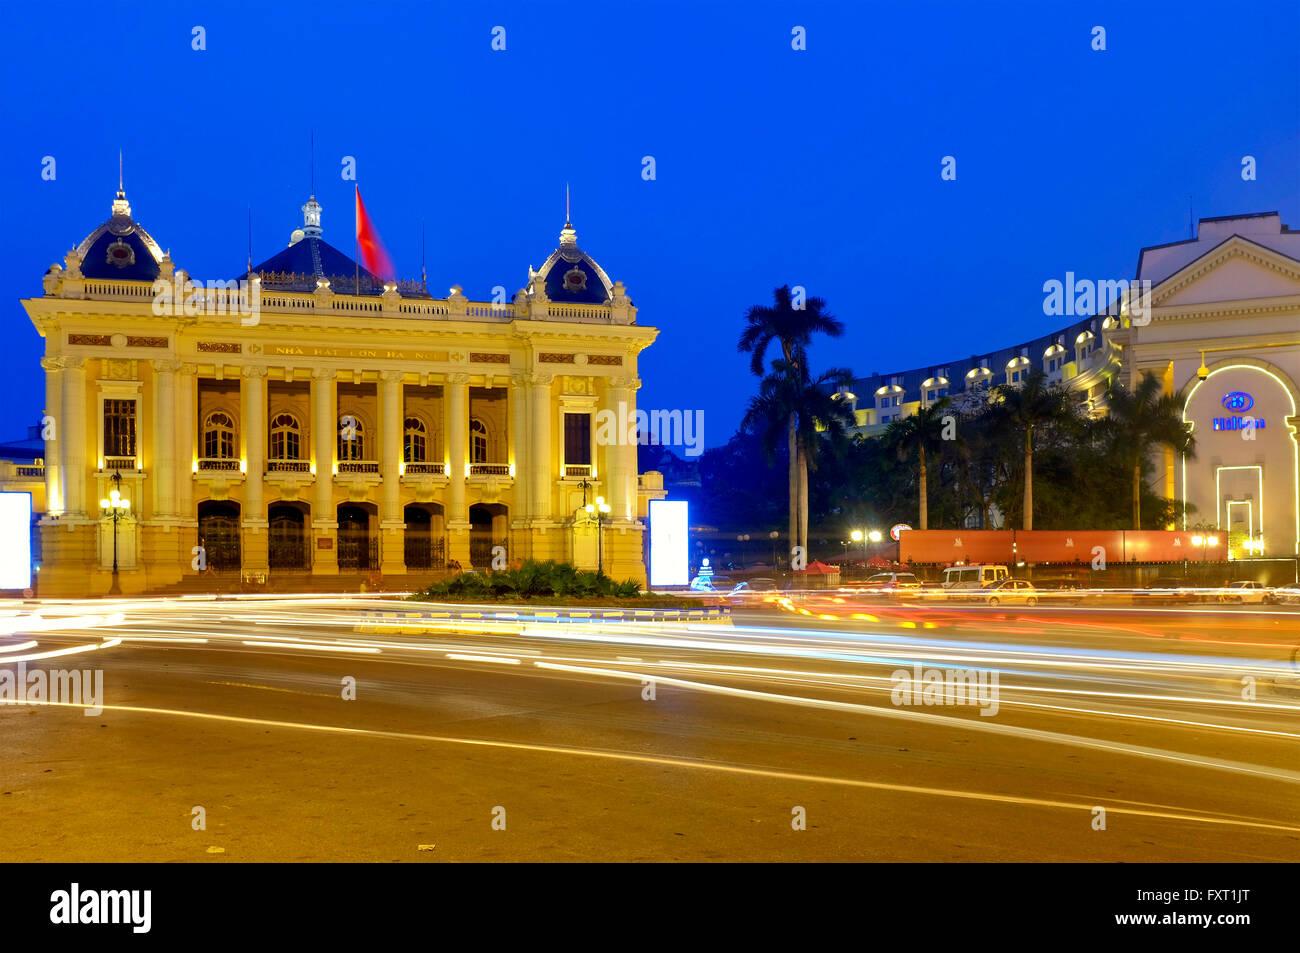 Hanoi Opera House, Hanoi, Vietnam - Stock Image